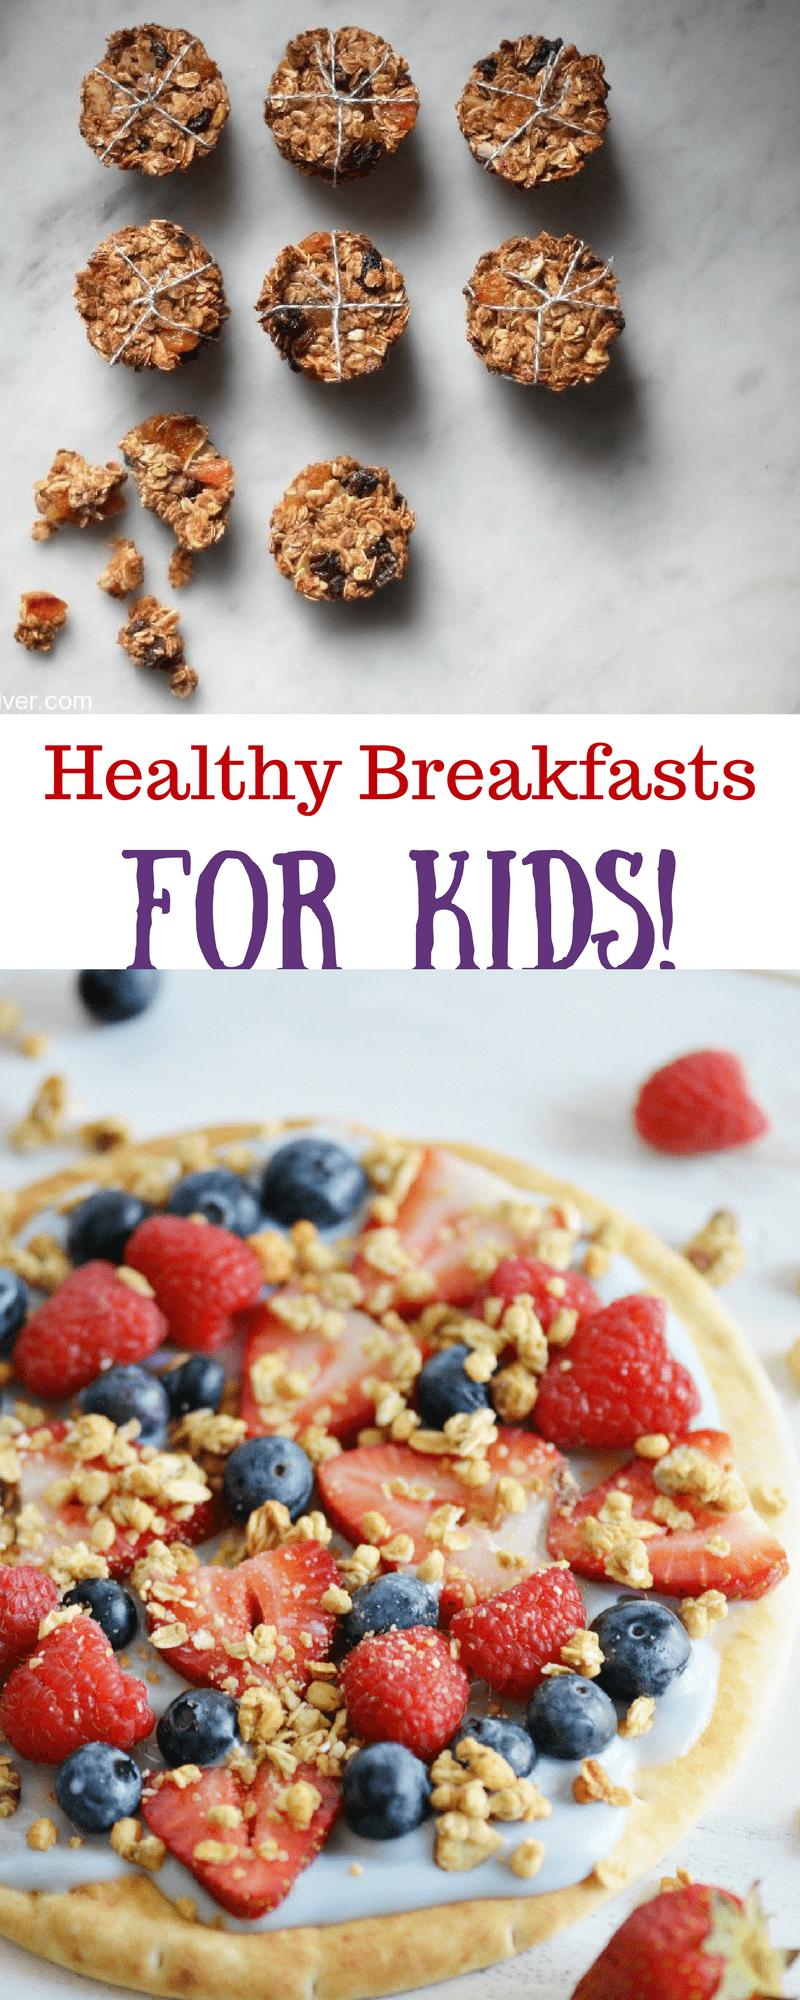 44 Healthy Breakfasts for Kids